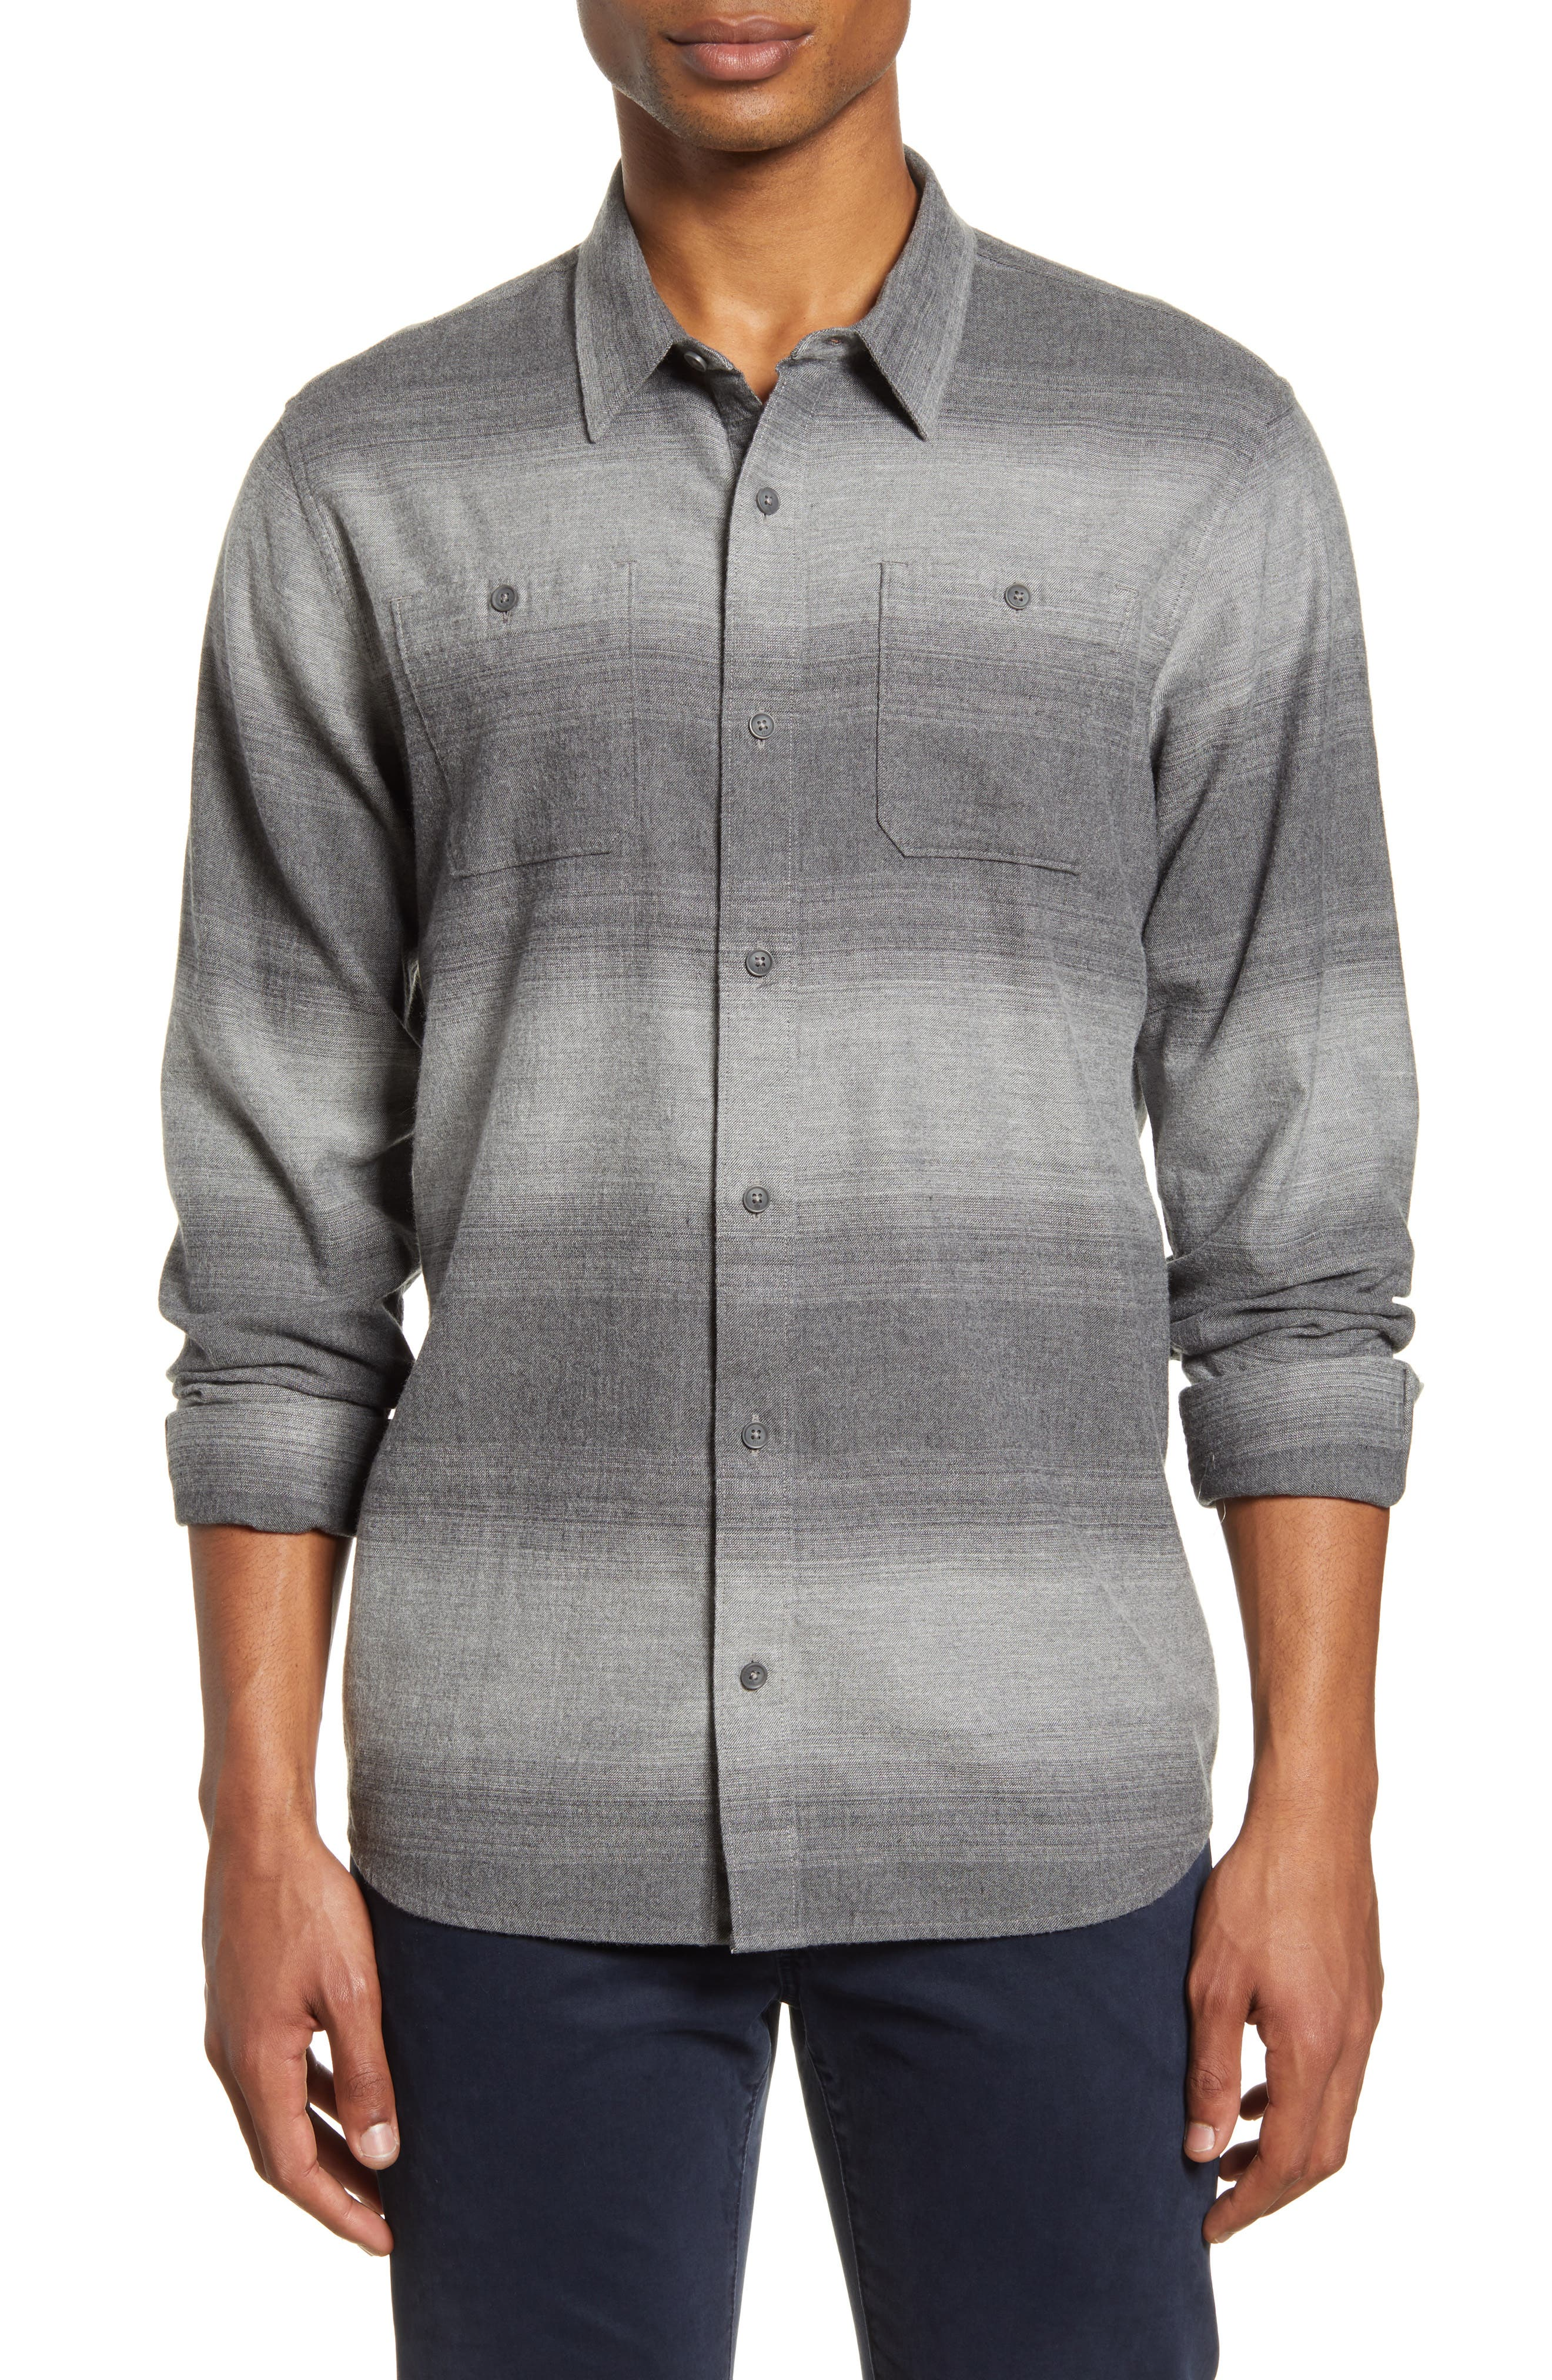 Image of TRAVIS MATHEW Rya Eddie Button Down Shirt